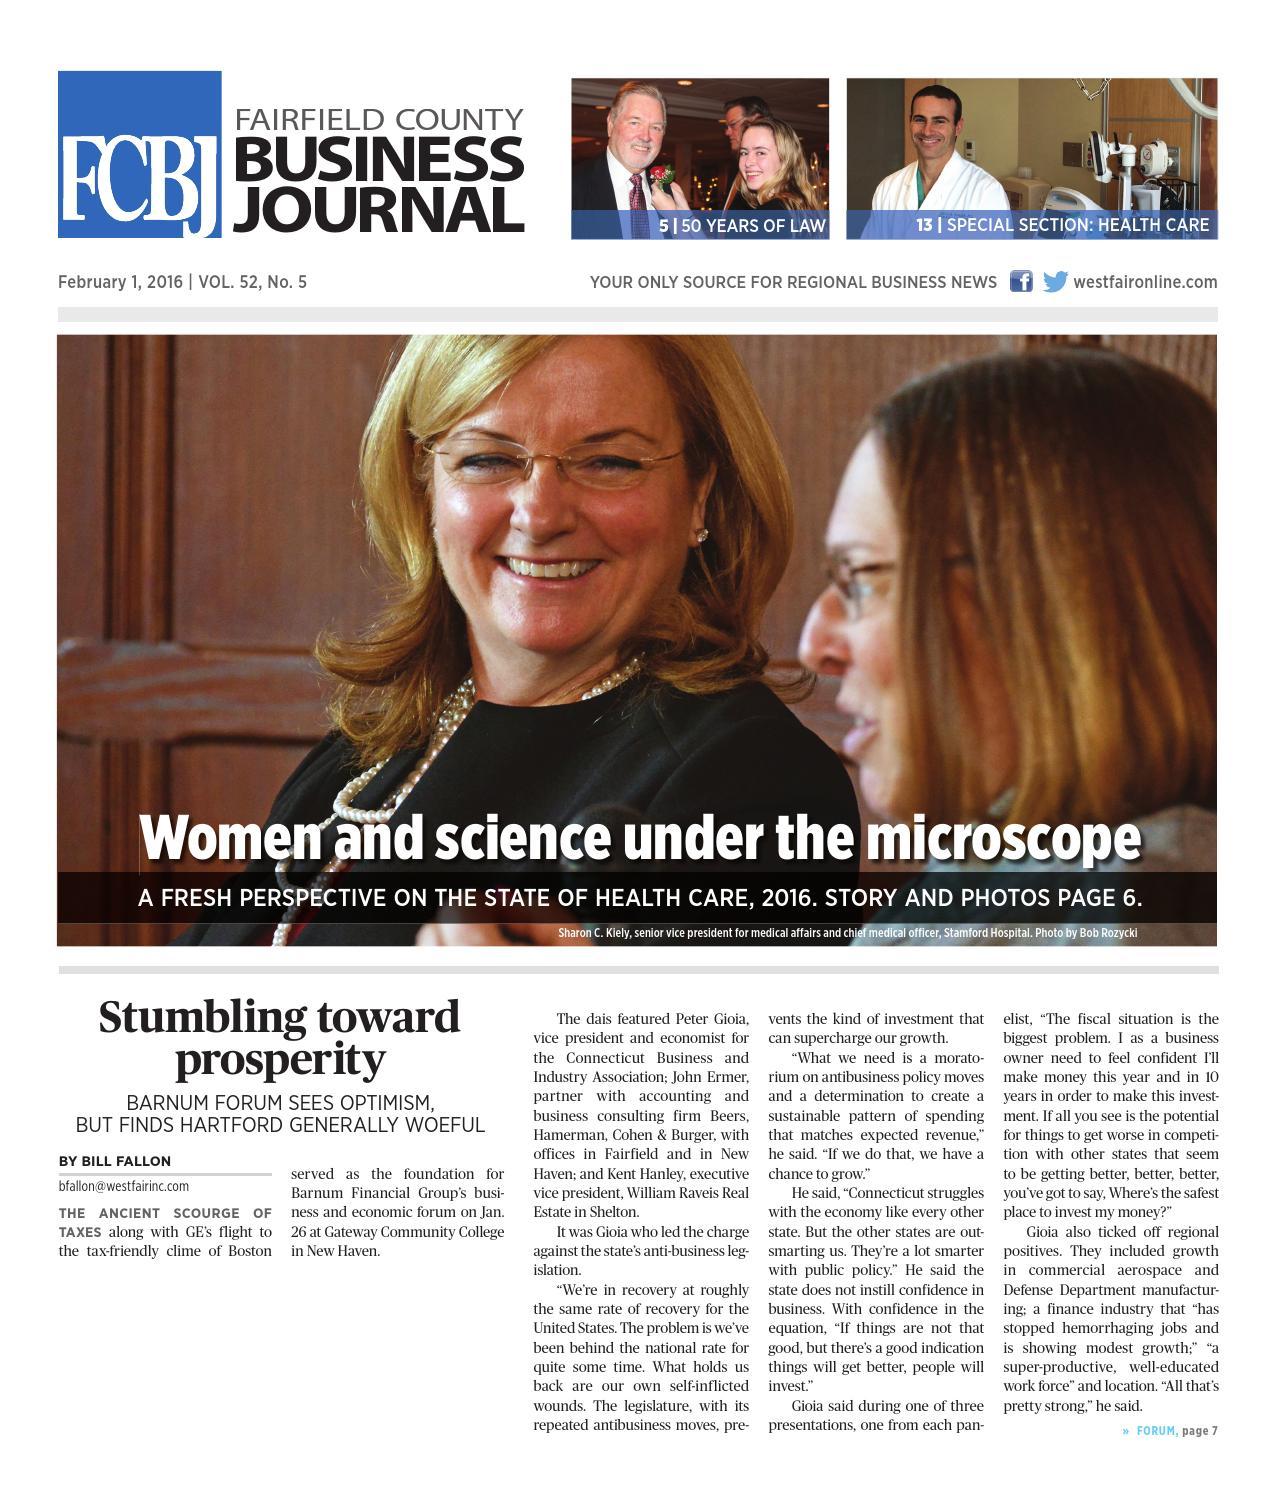 Fairfield County Business Journal 020116 By Wag Magazine Issuu